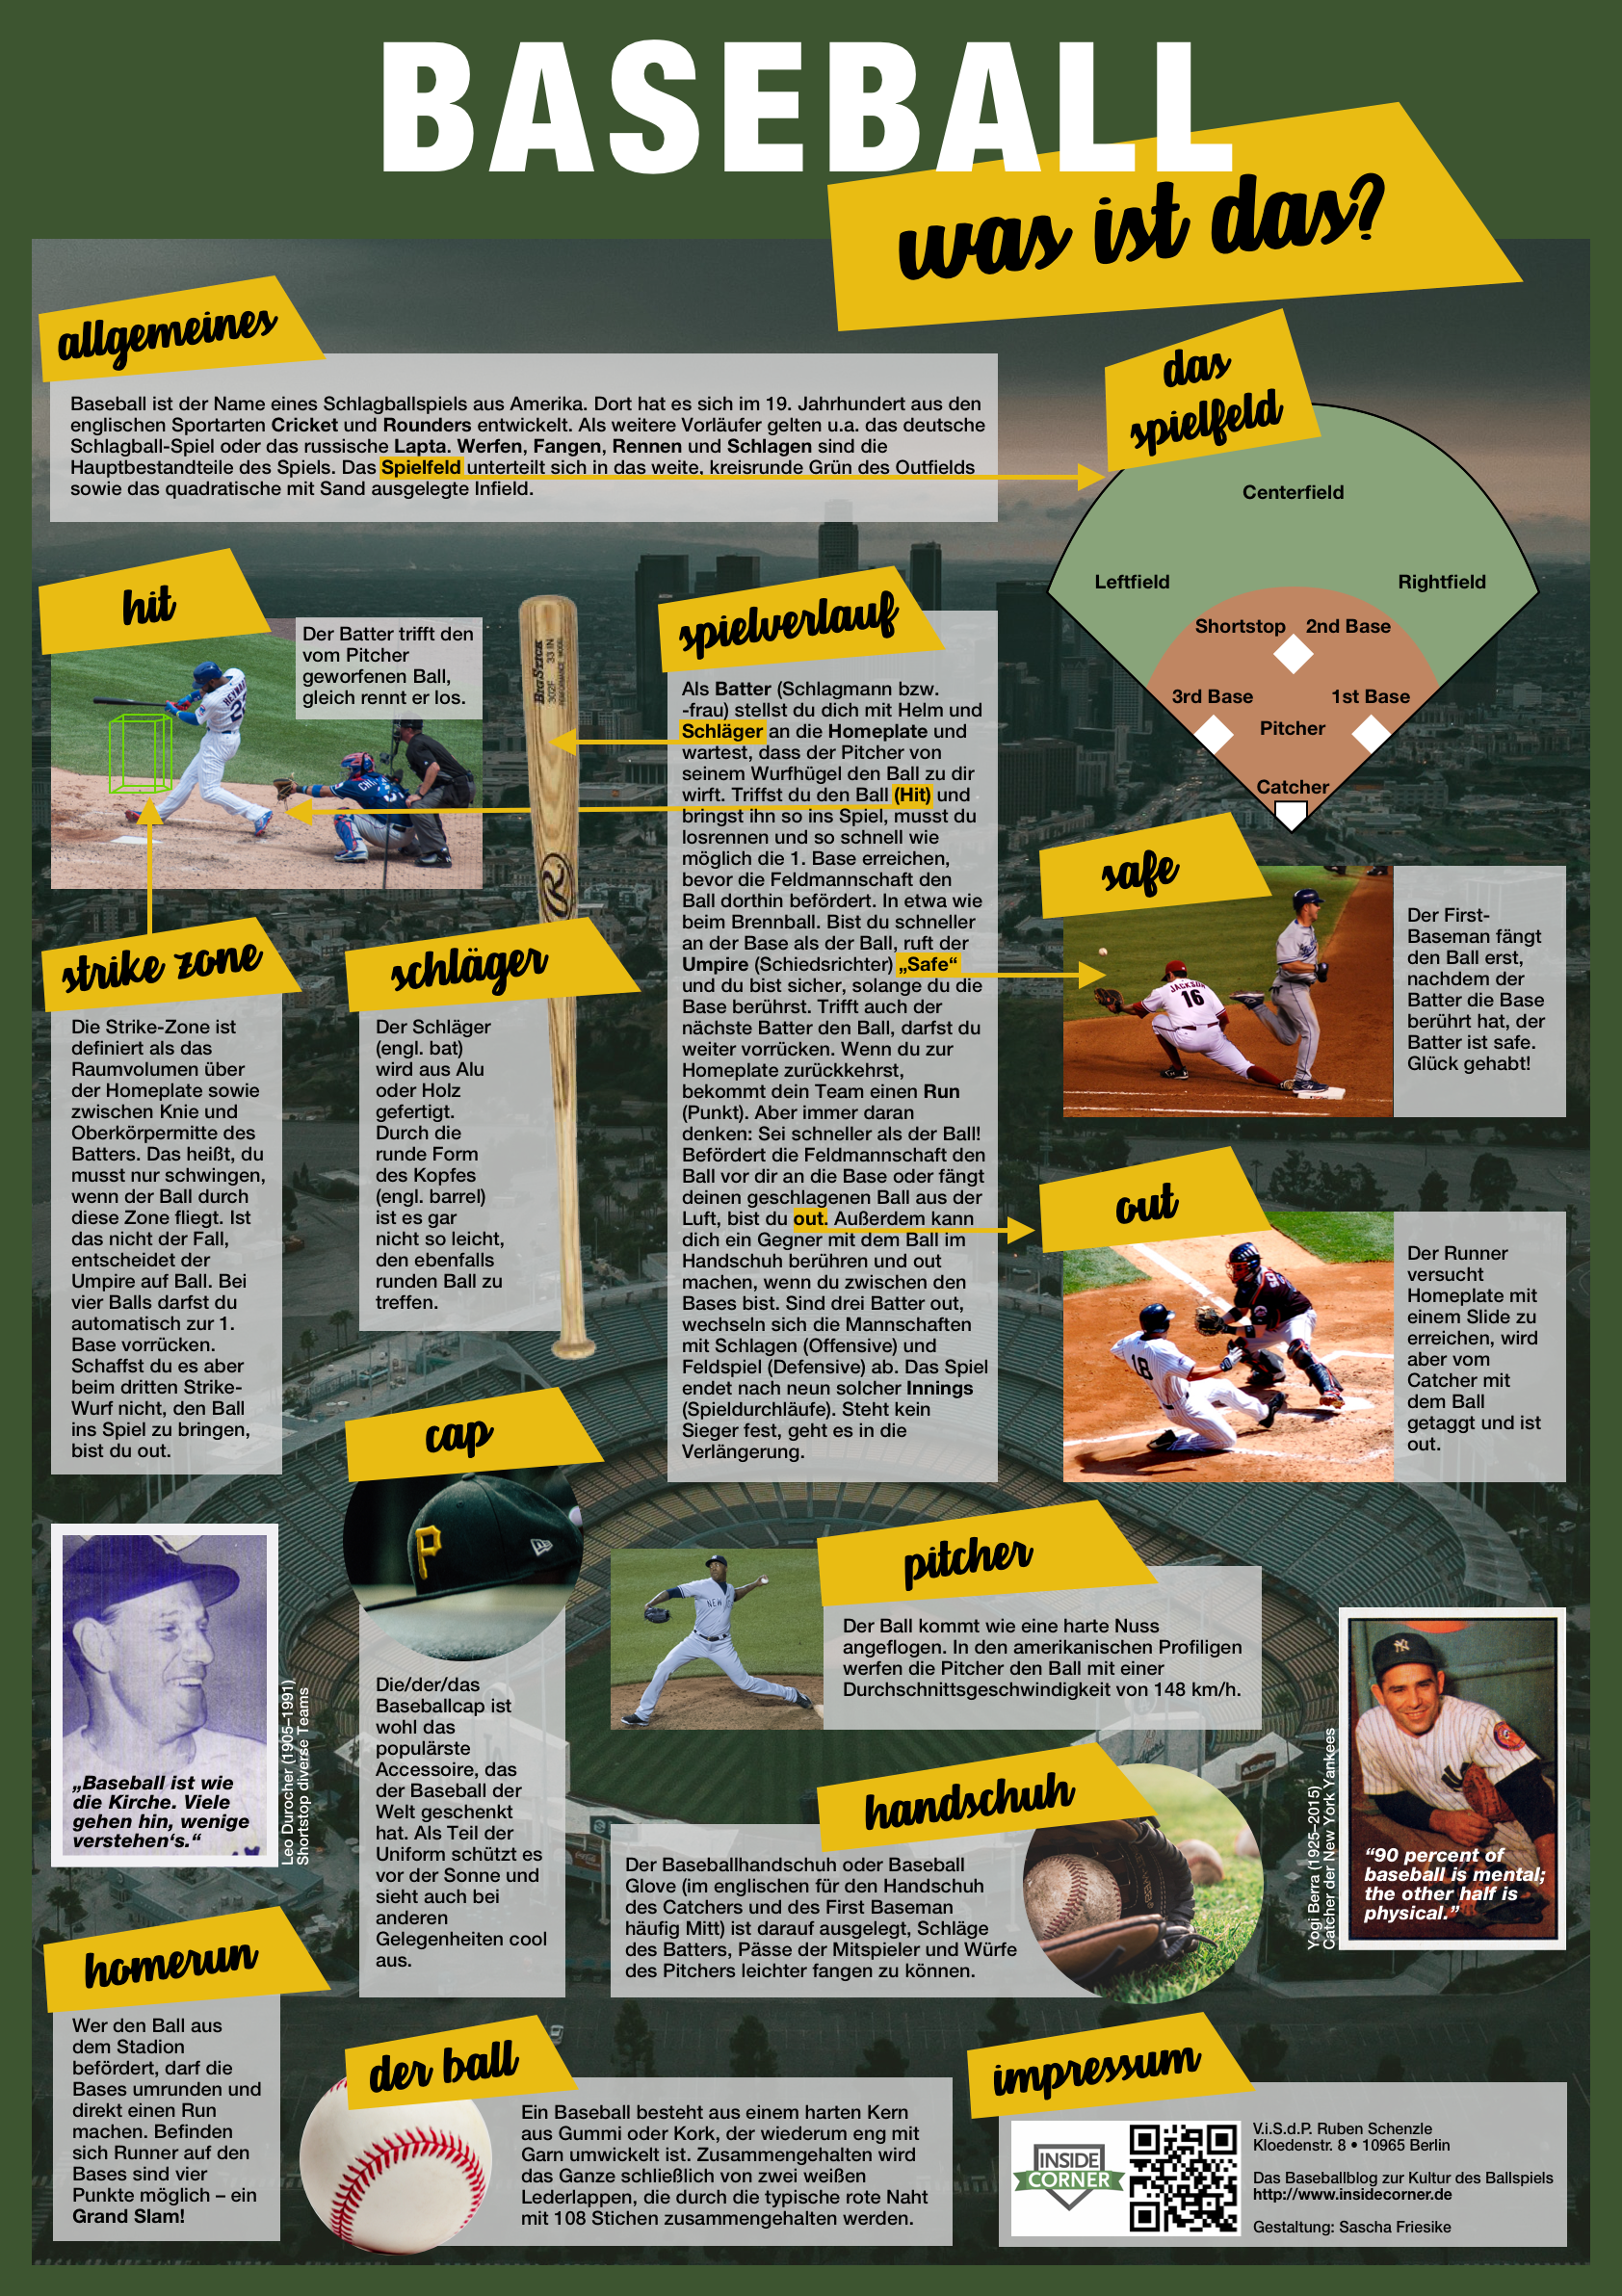 Poster 1 - Baseball was ist das_@1x